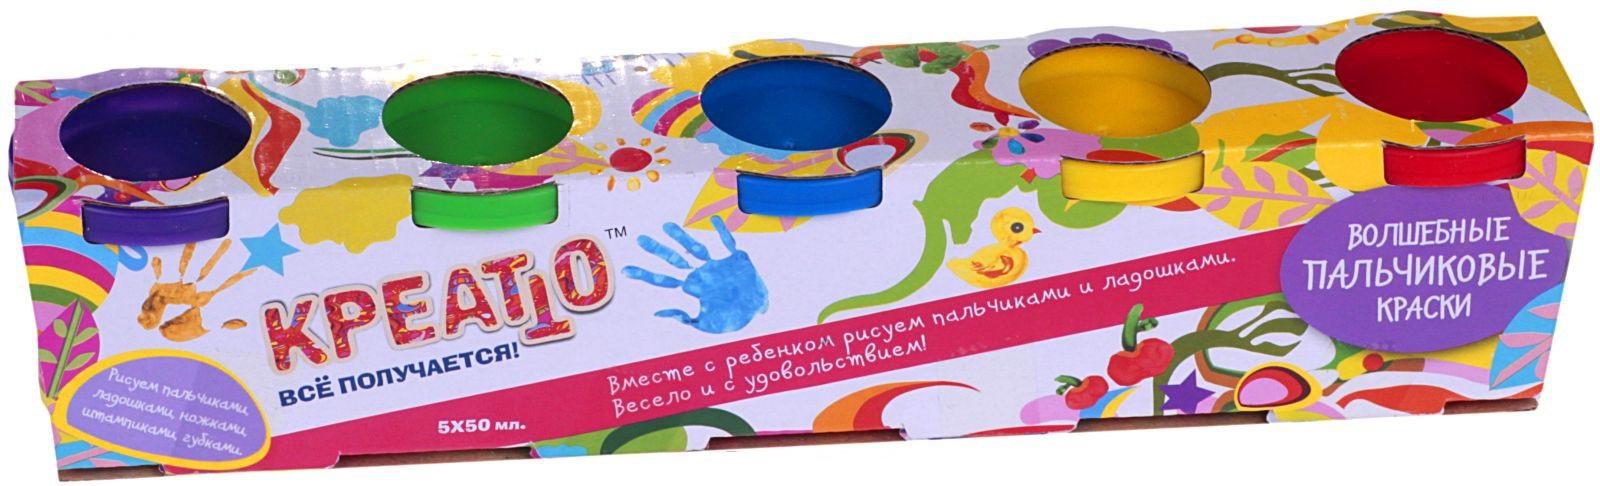 KREATTO. Пальчиковые краски  6 цв - 6 цветов по 50мл.